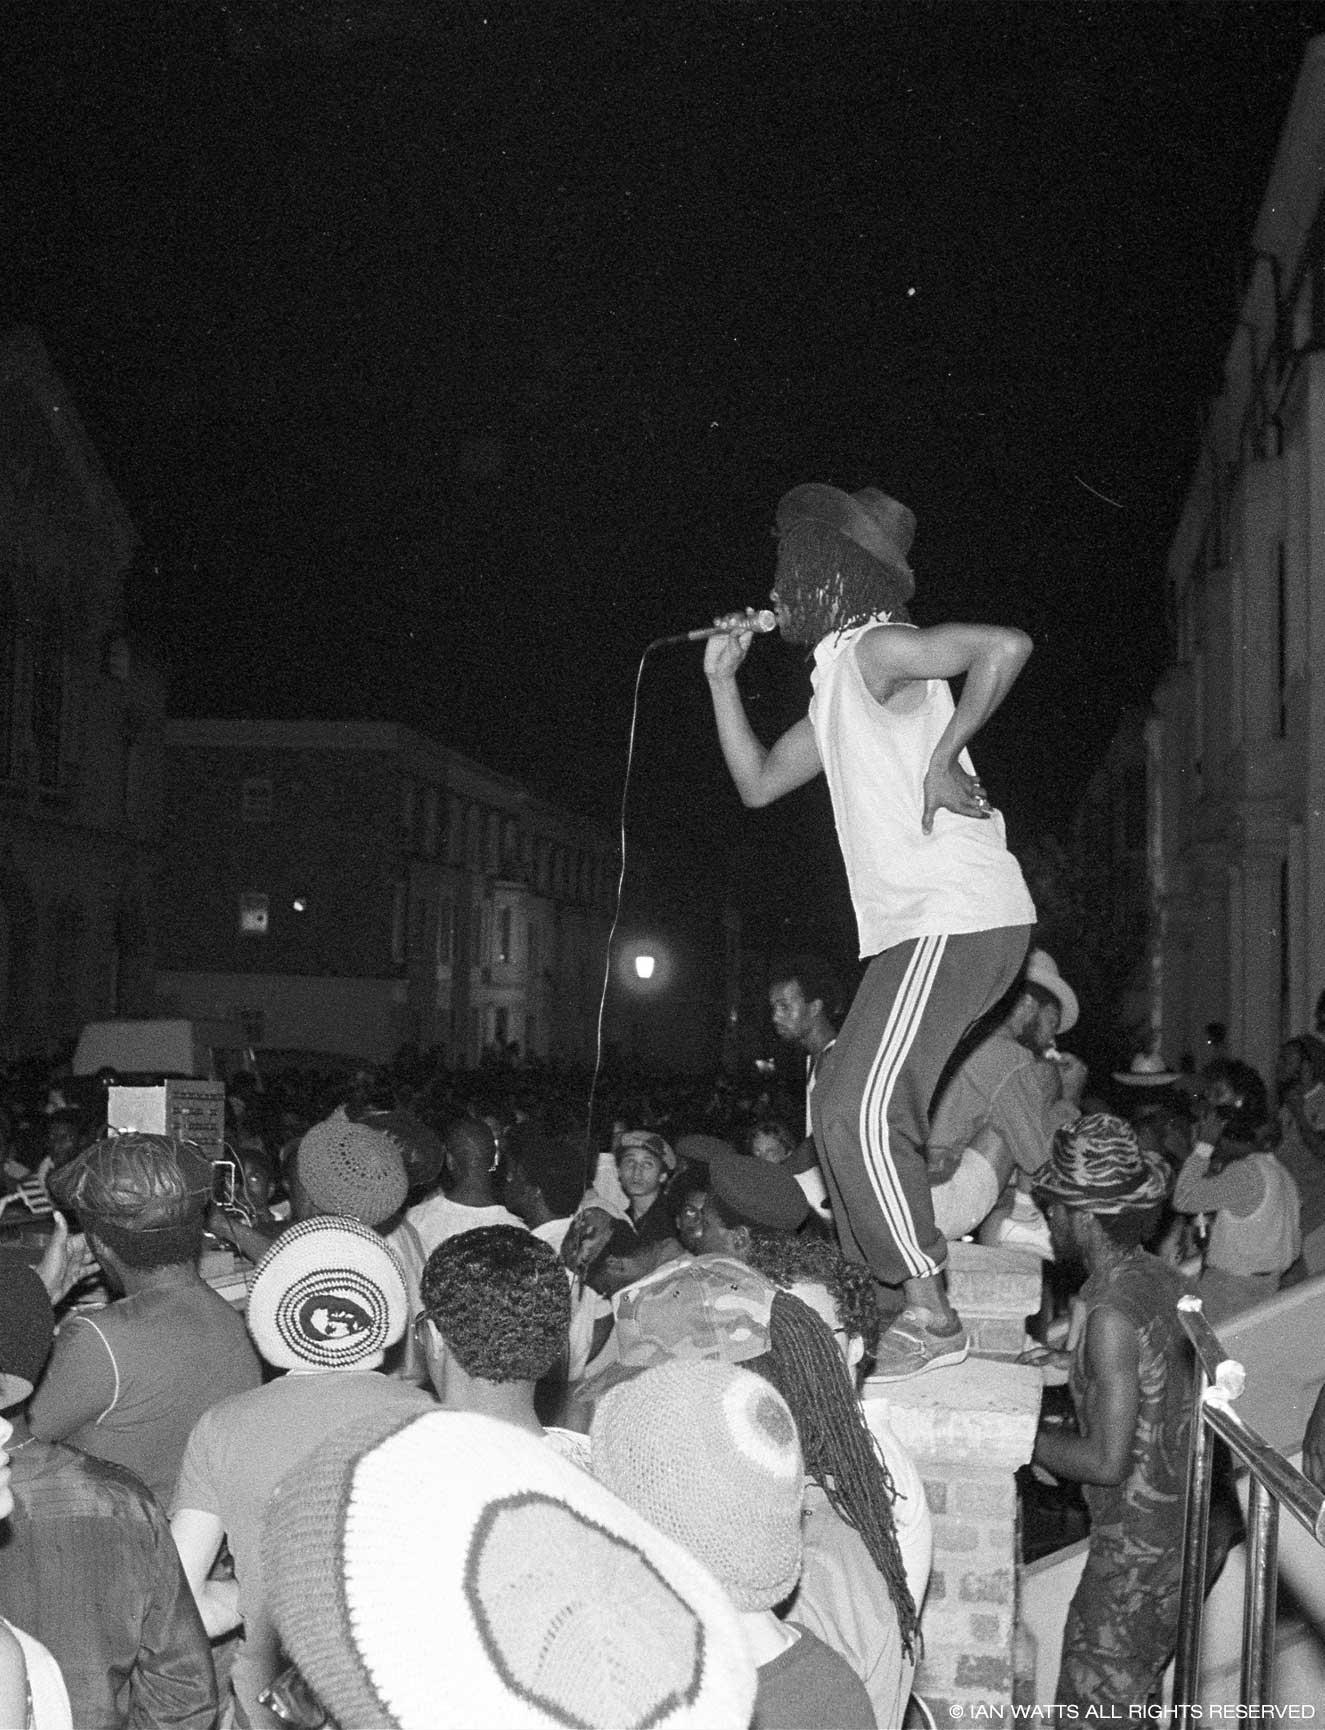 everpress-blog-documenting-notting-hill-carnival-ian-watts-lead-image